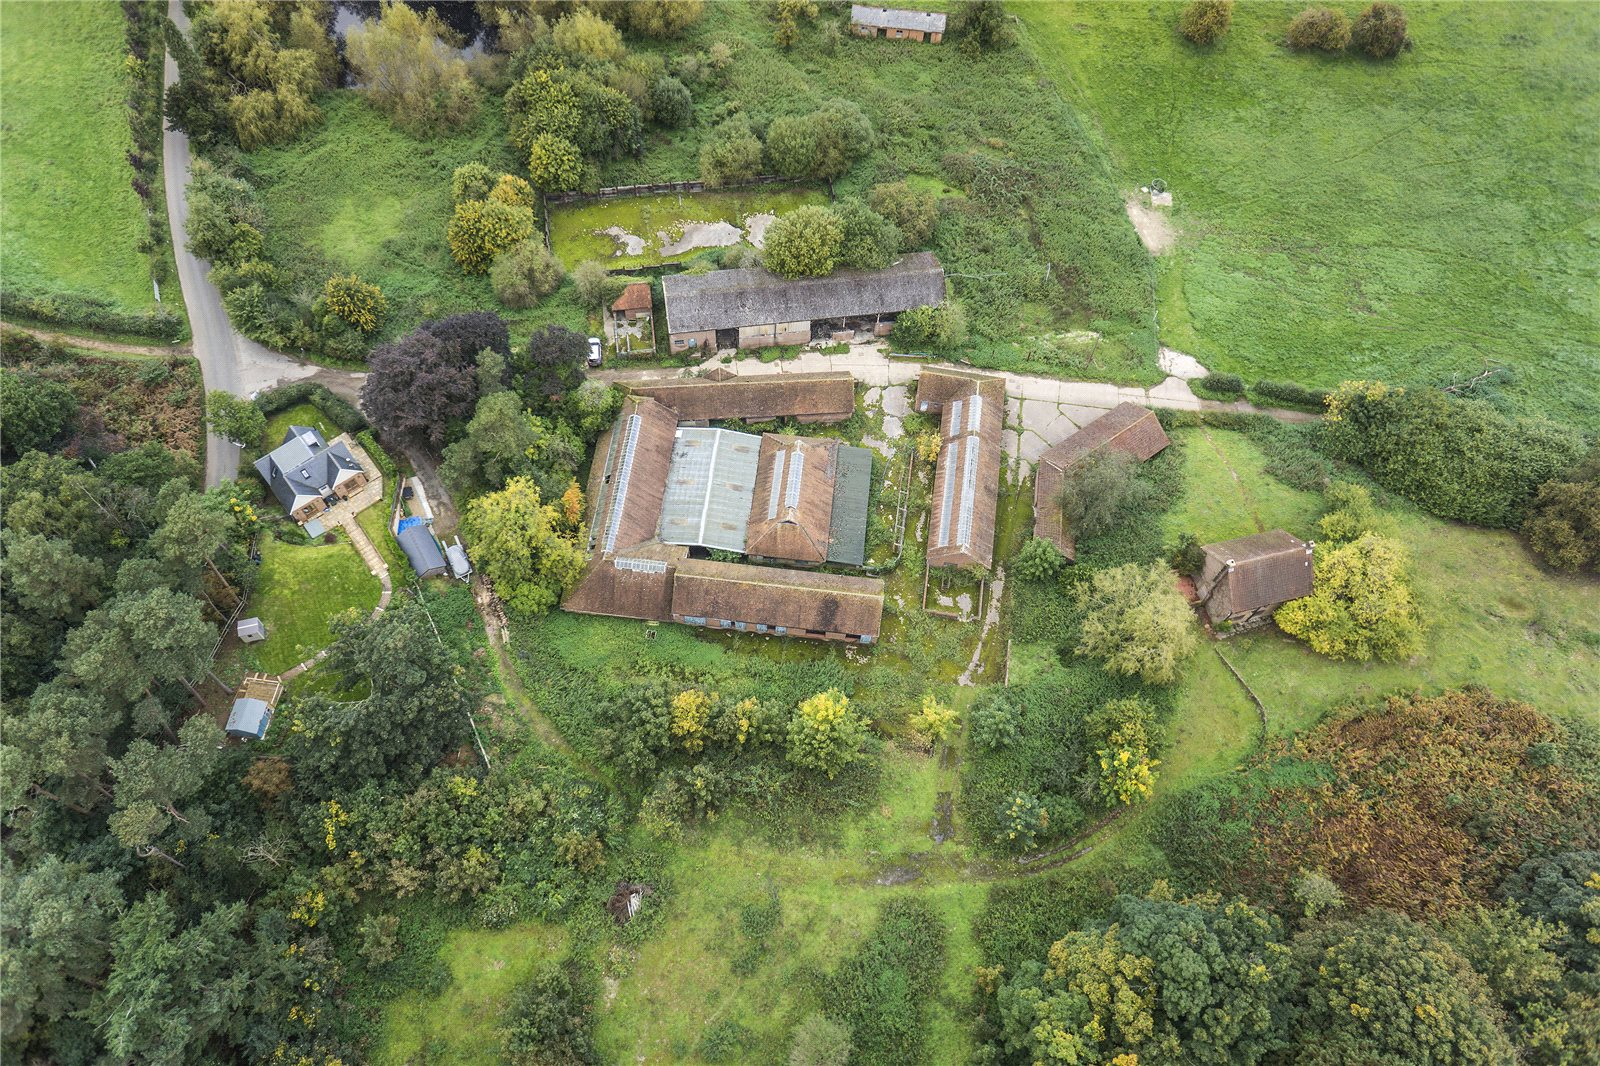 农场 / 牧场 / 种植园 为 销售 在 Halfpenny Lane, Guildford, Surrey, GU4 Guildford, 英格兰